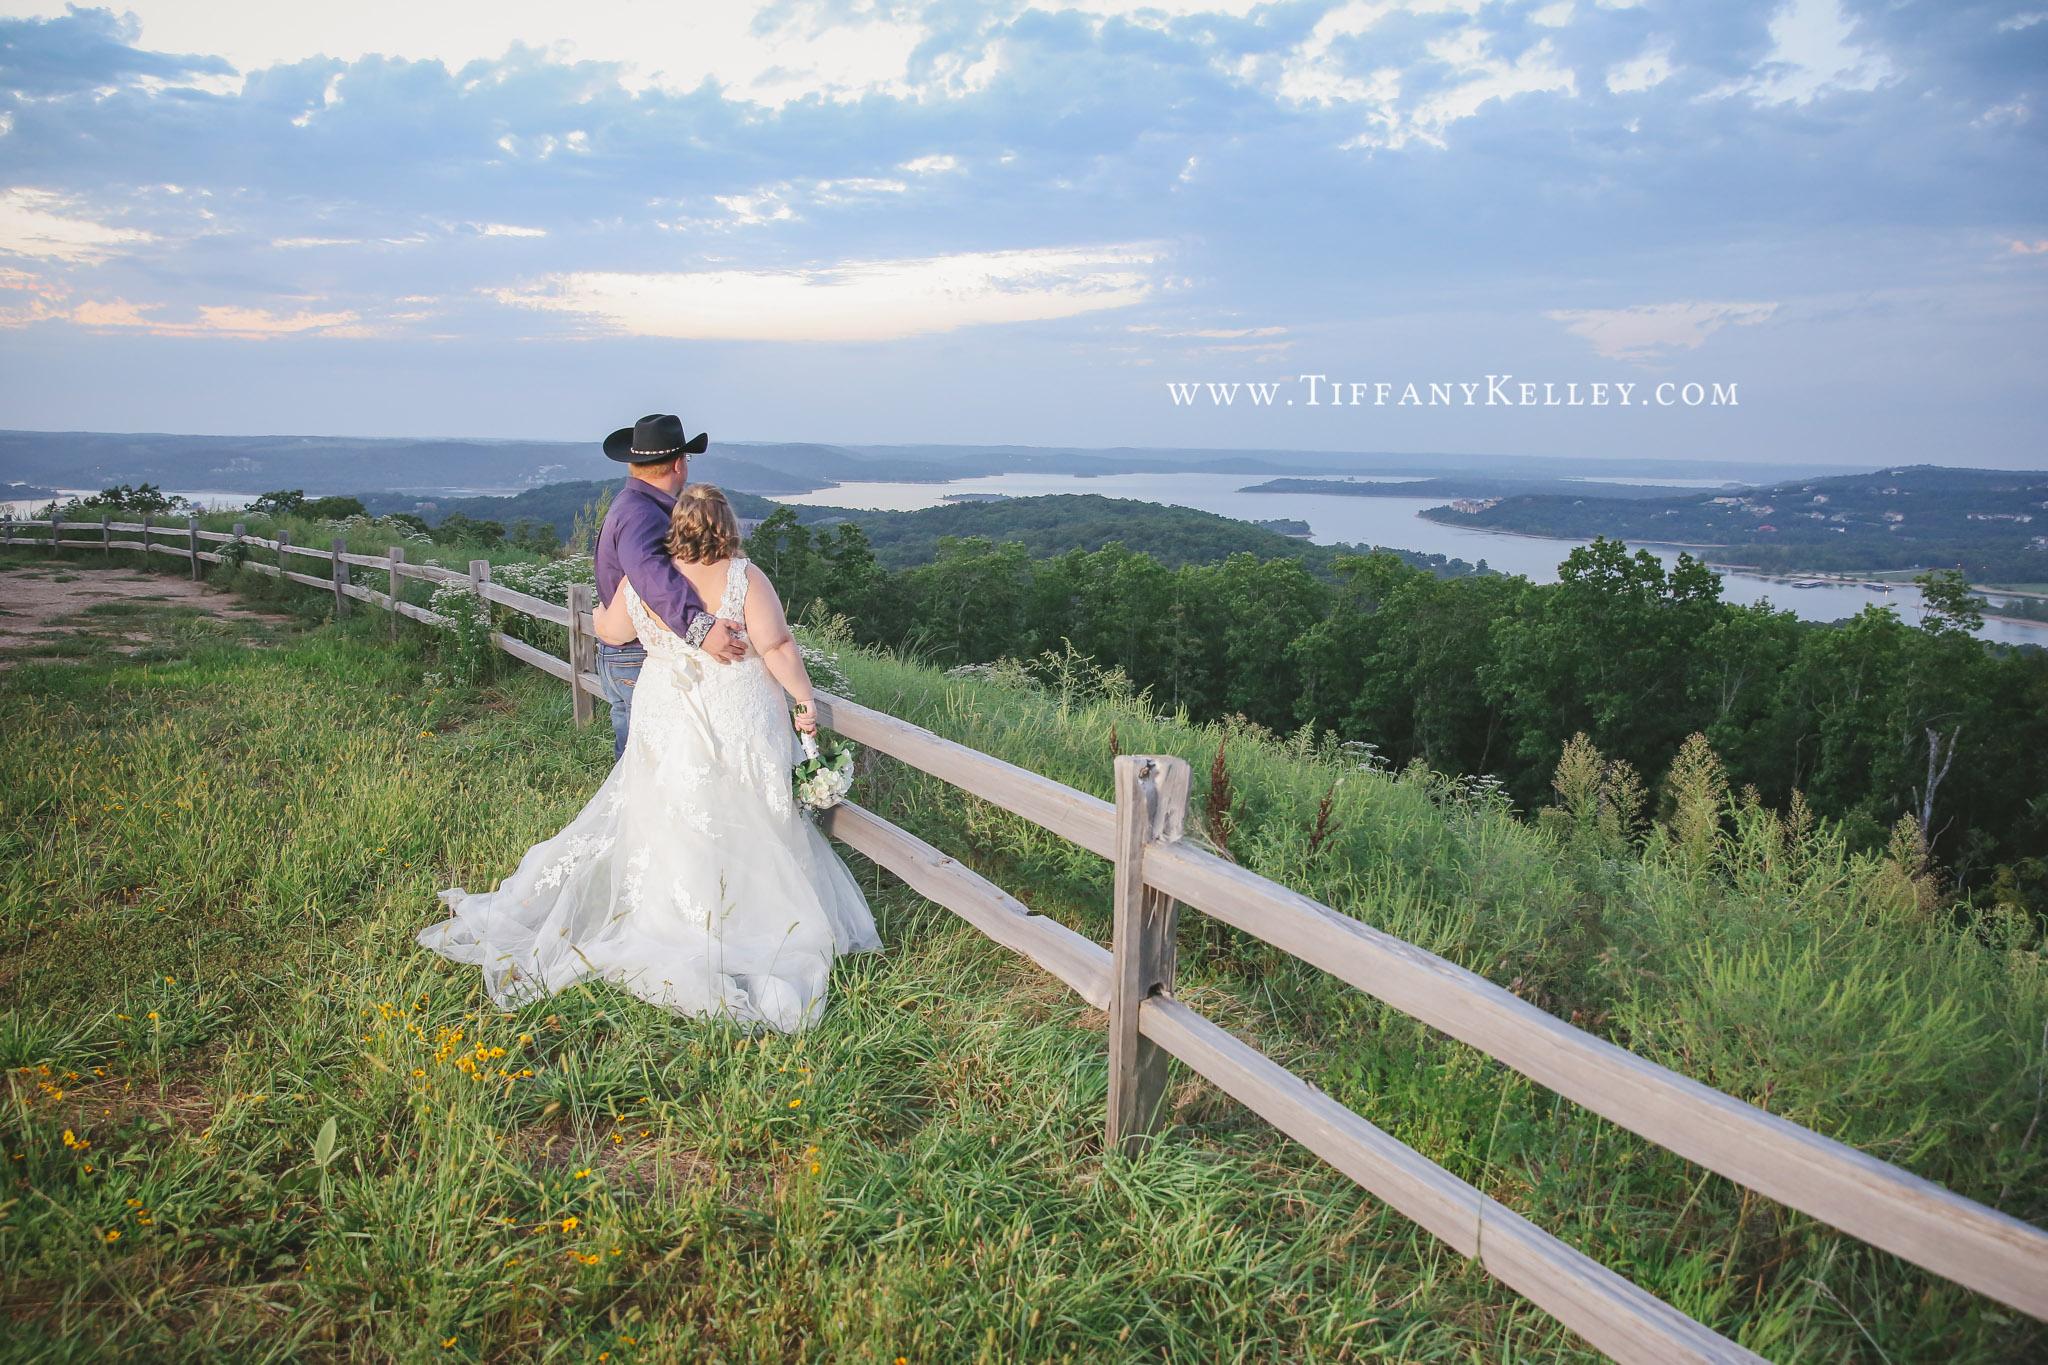 branson-missouri-big-cedar-lodge-wedding-photographer-tiffany-kelley-photography-17